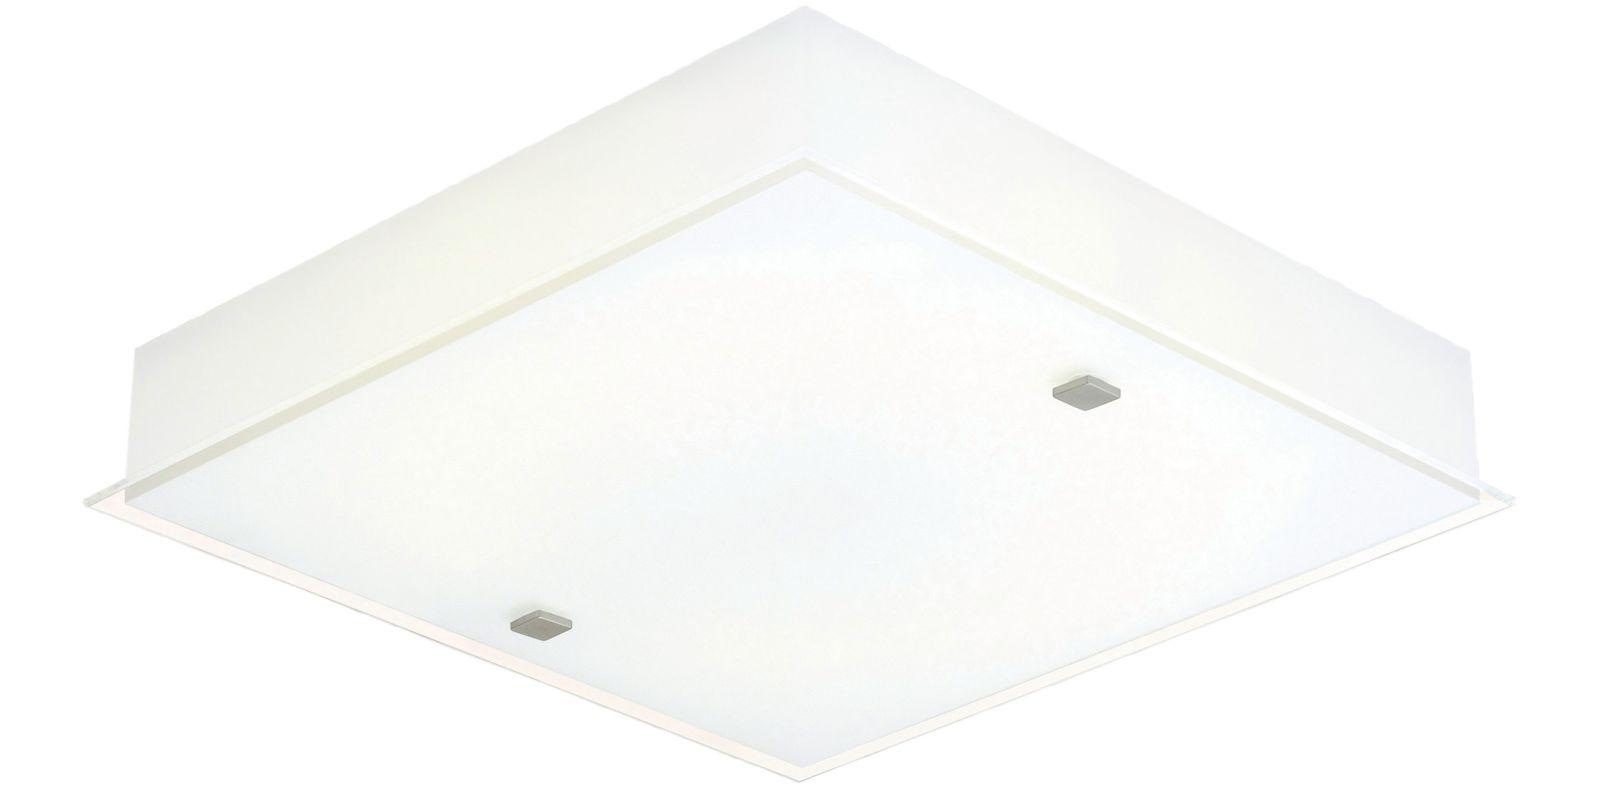 Eglo 90655A 1 Light Flush Mount Ceiling Fixture from the Sapri